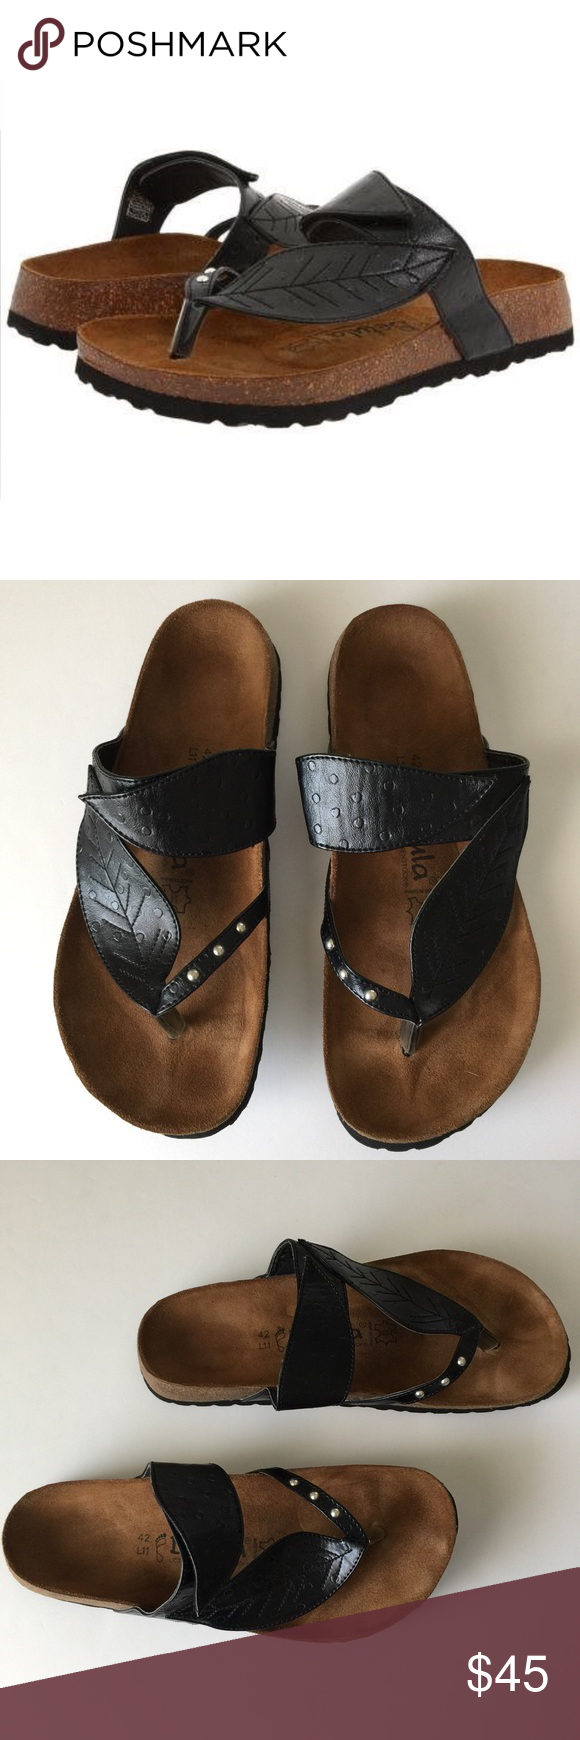 Black sandals size 11 - Birkenstock Betula Black Bombay Sandals Size 11